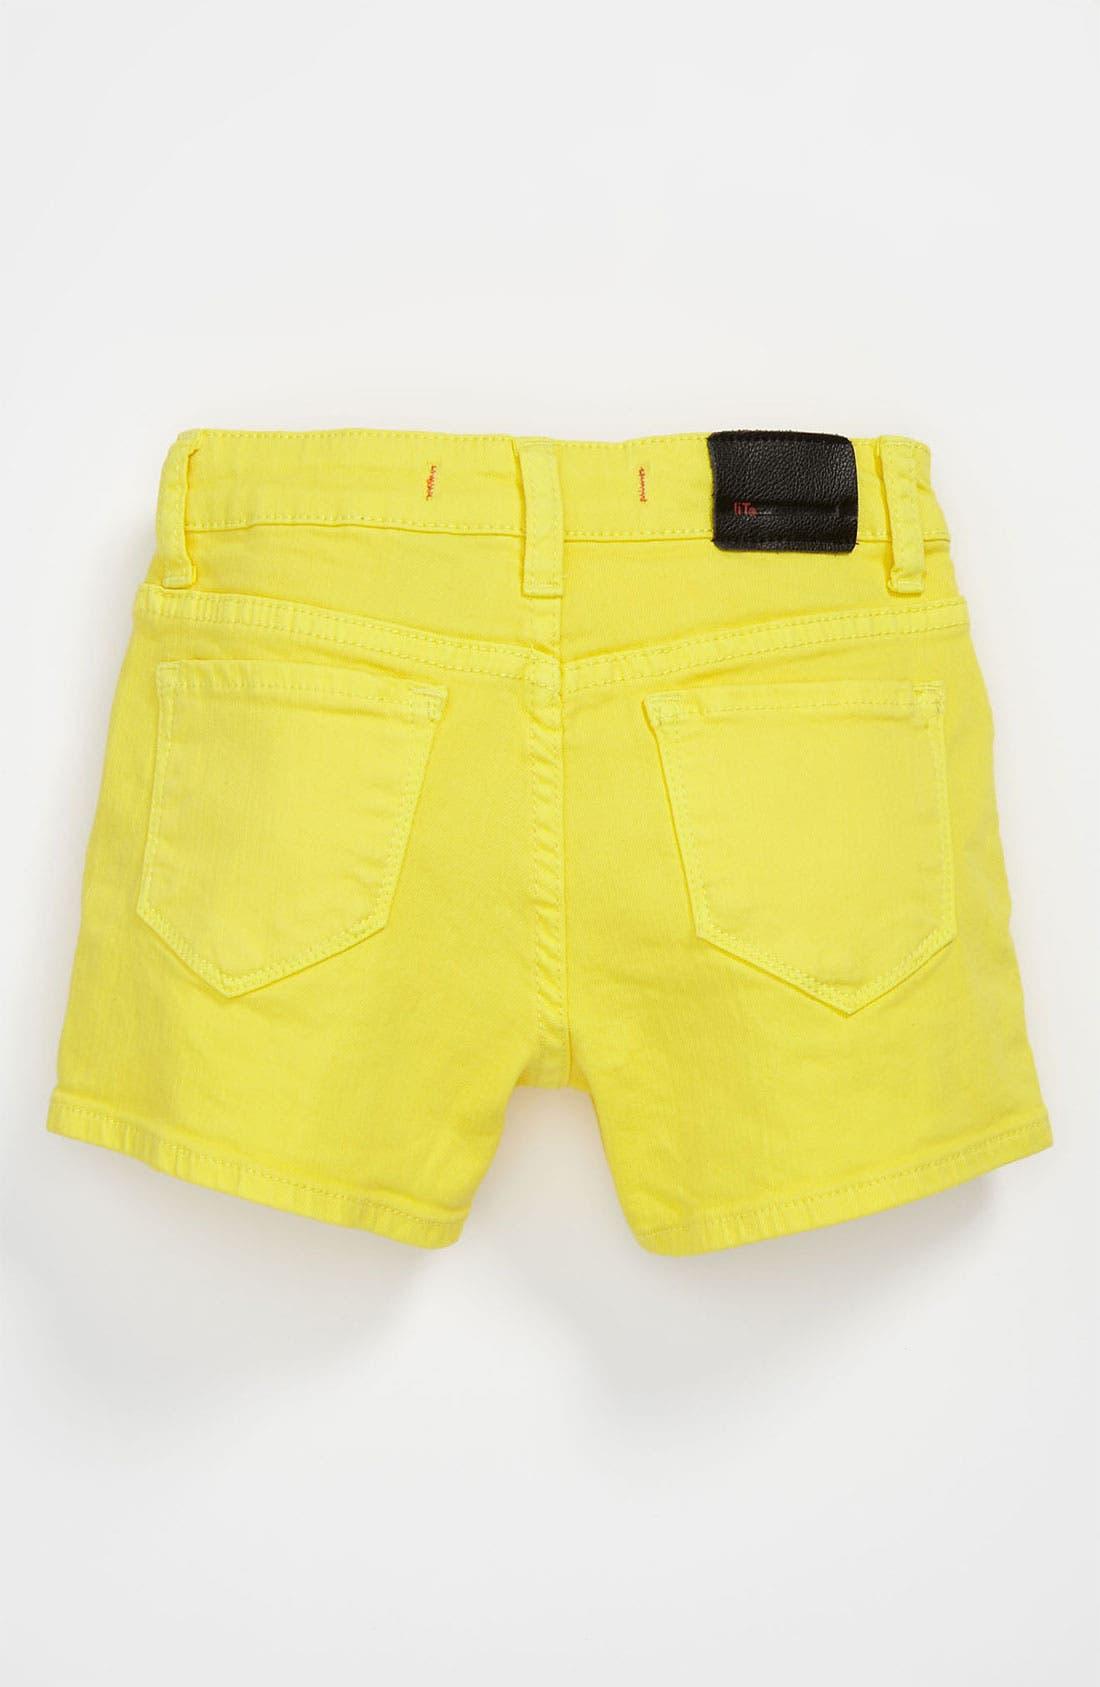 Main Image - !iT JEANS Five Pocket Shorts (Big Girls)